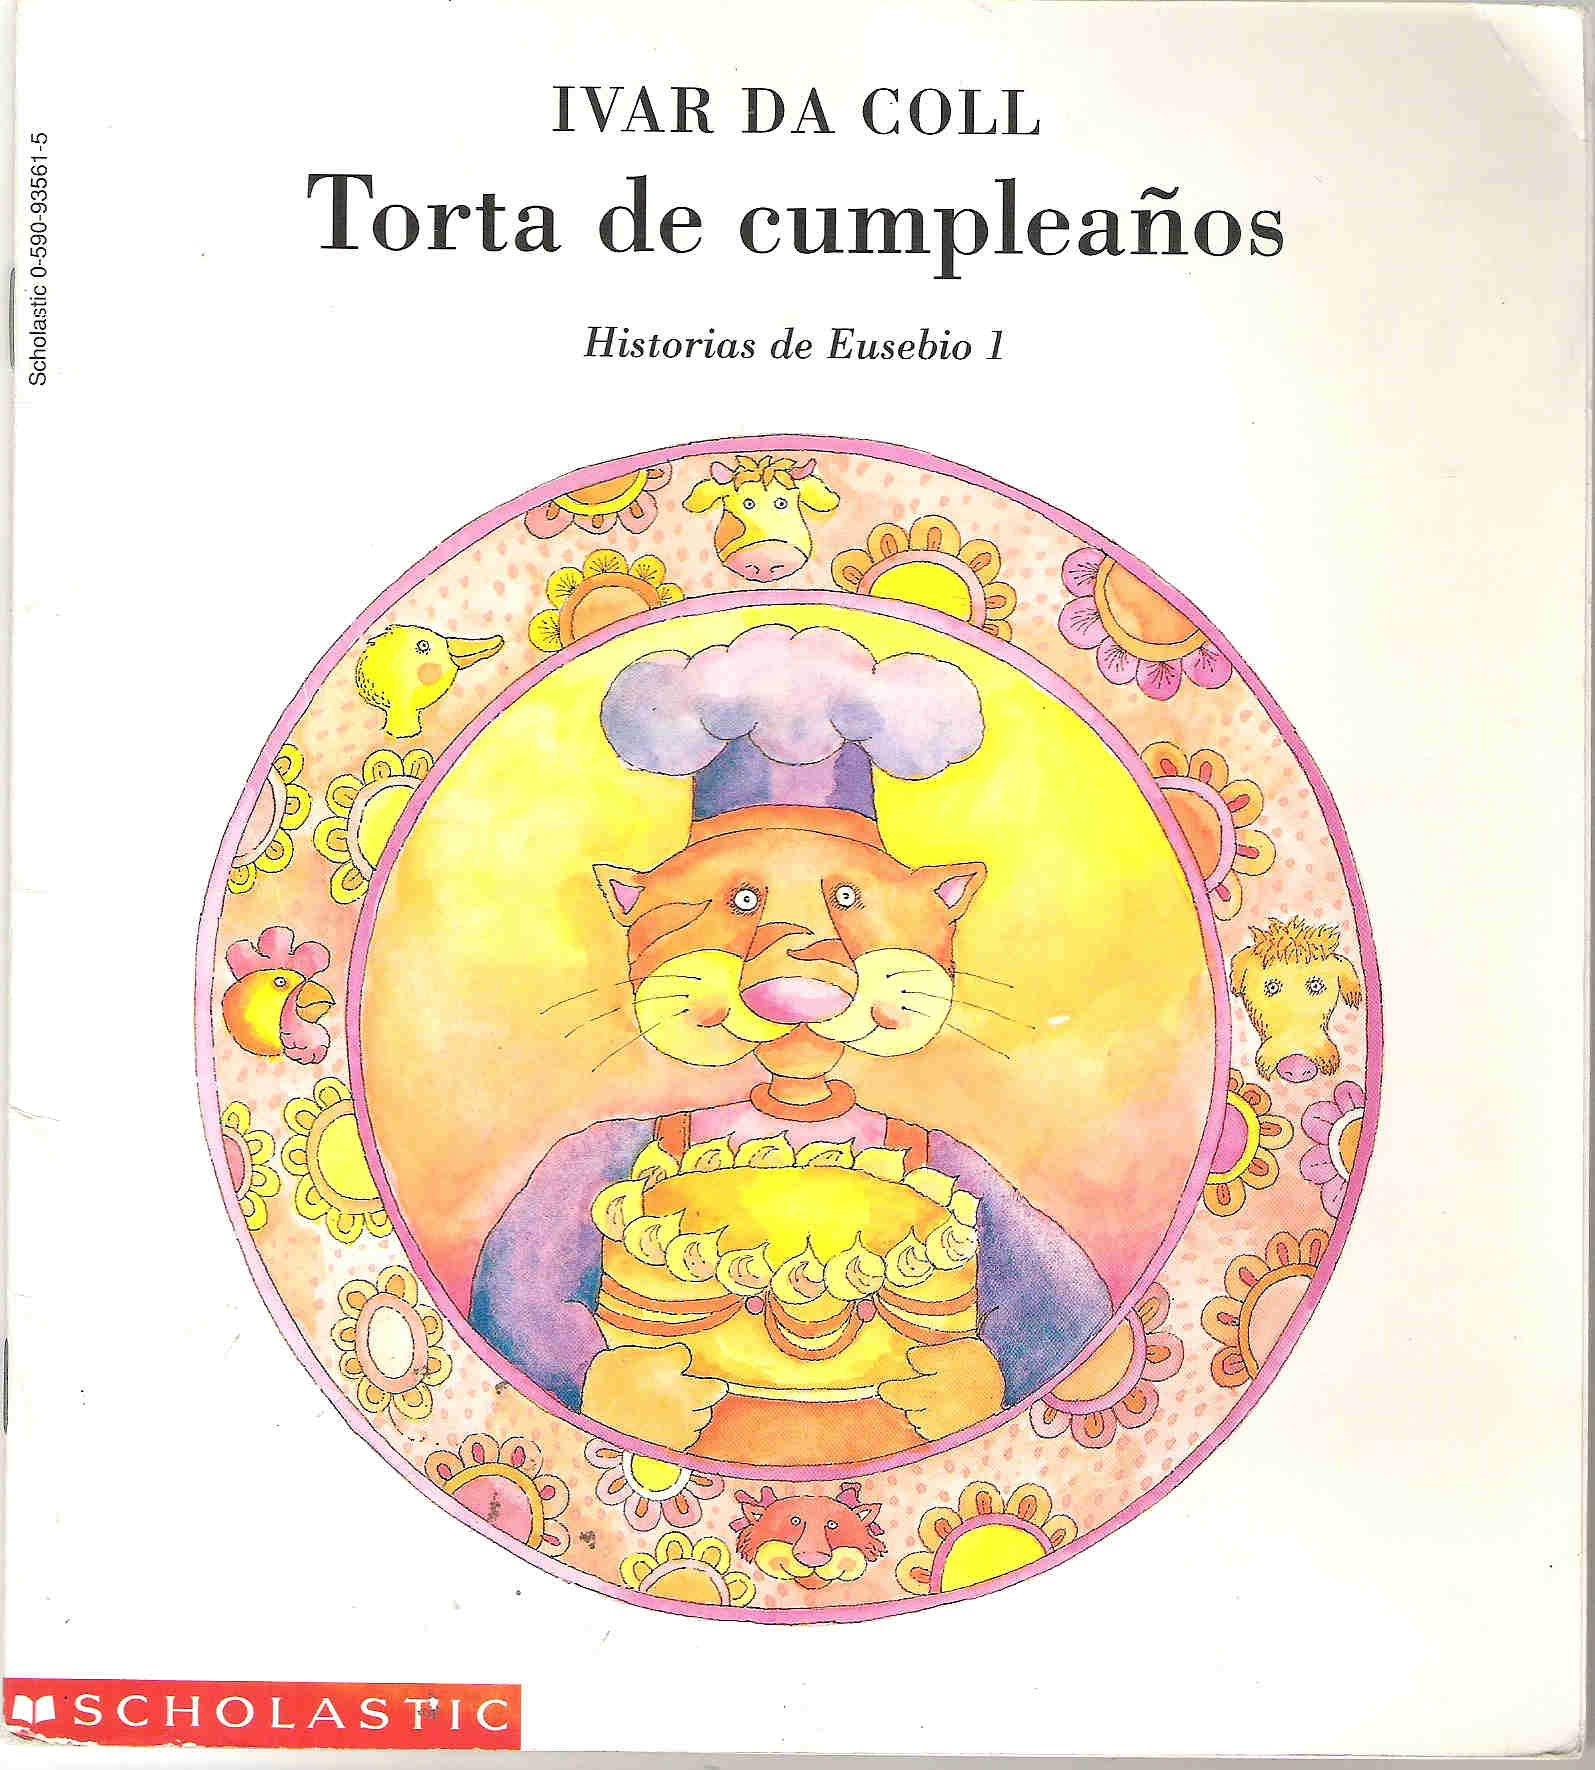 Torta de Cumpleanos: historias de Eusebio 1: Ivar da Coll ...